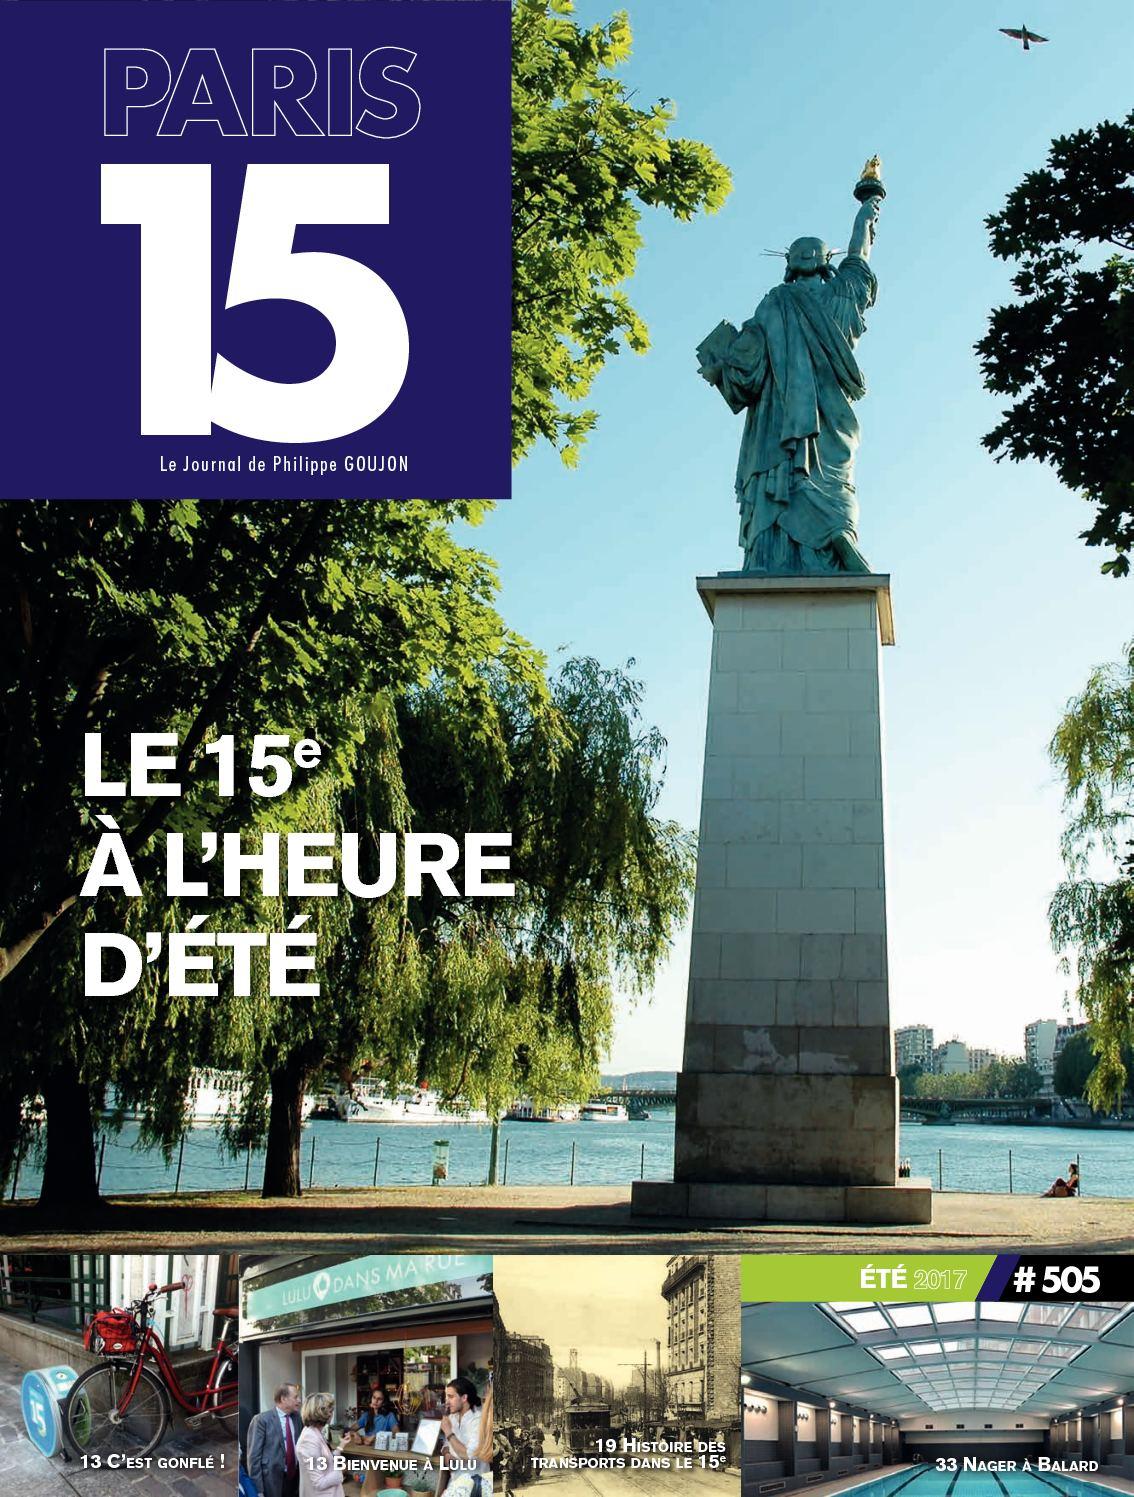 Vita Confort 25 Rue Lecourbe calaméo - paris 15 n°505